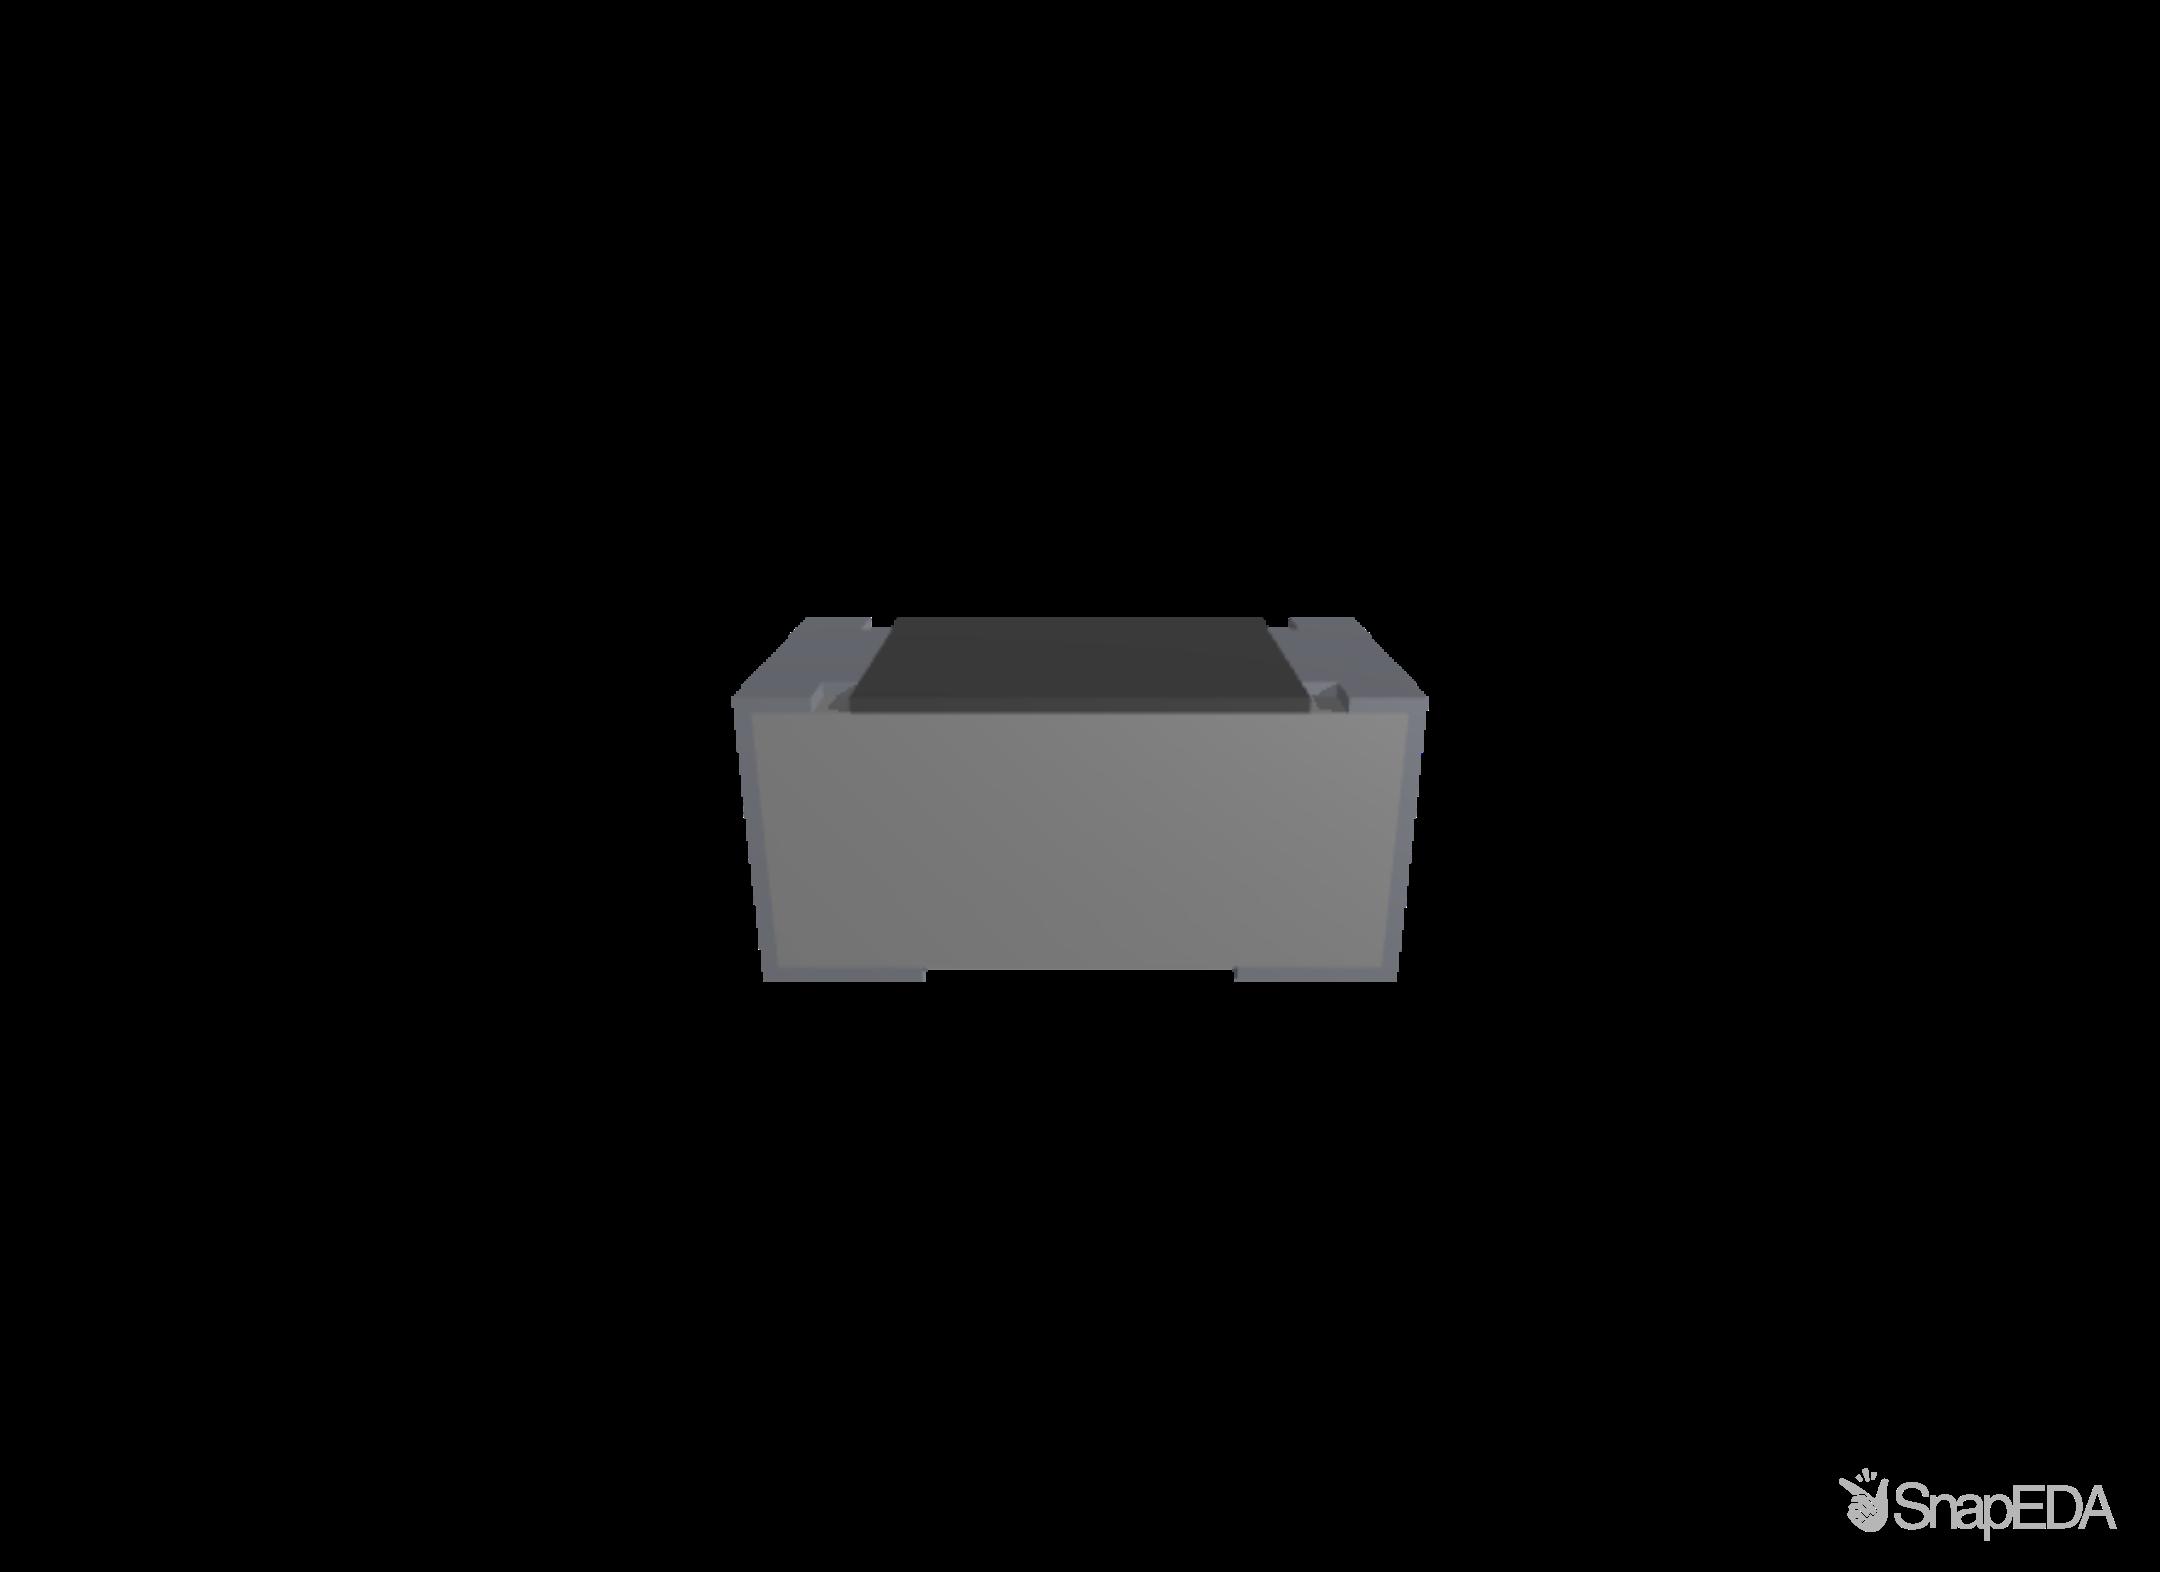 CRCW020110K0FNED 3D Model